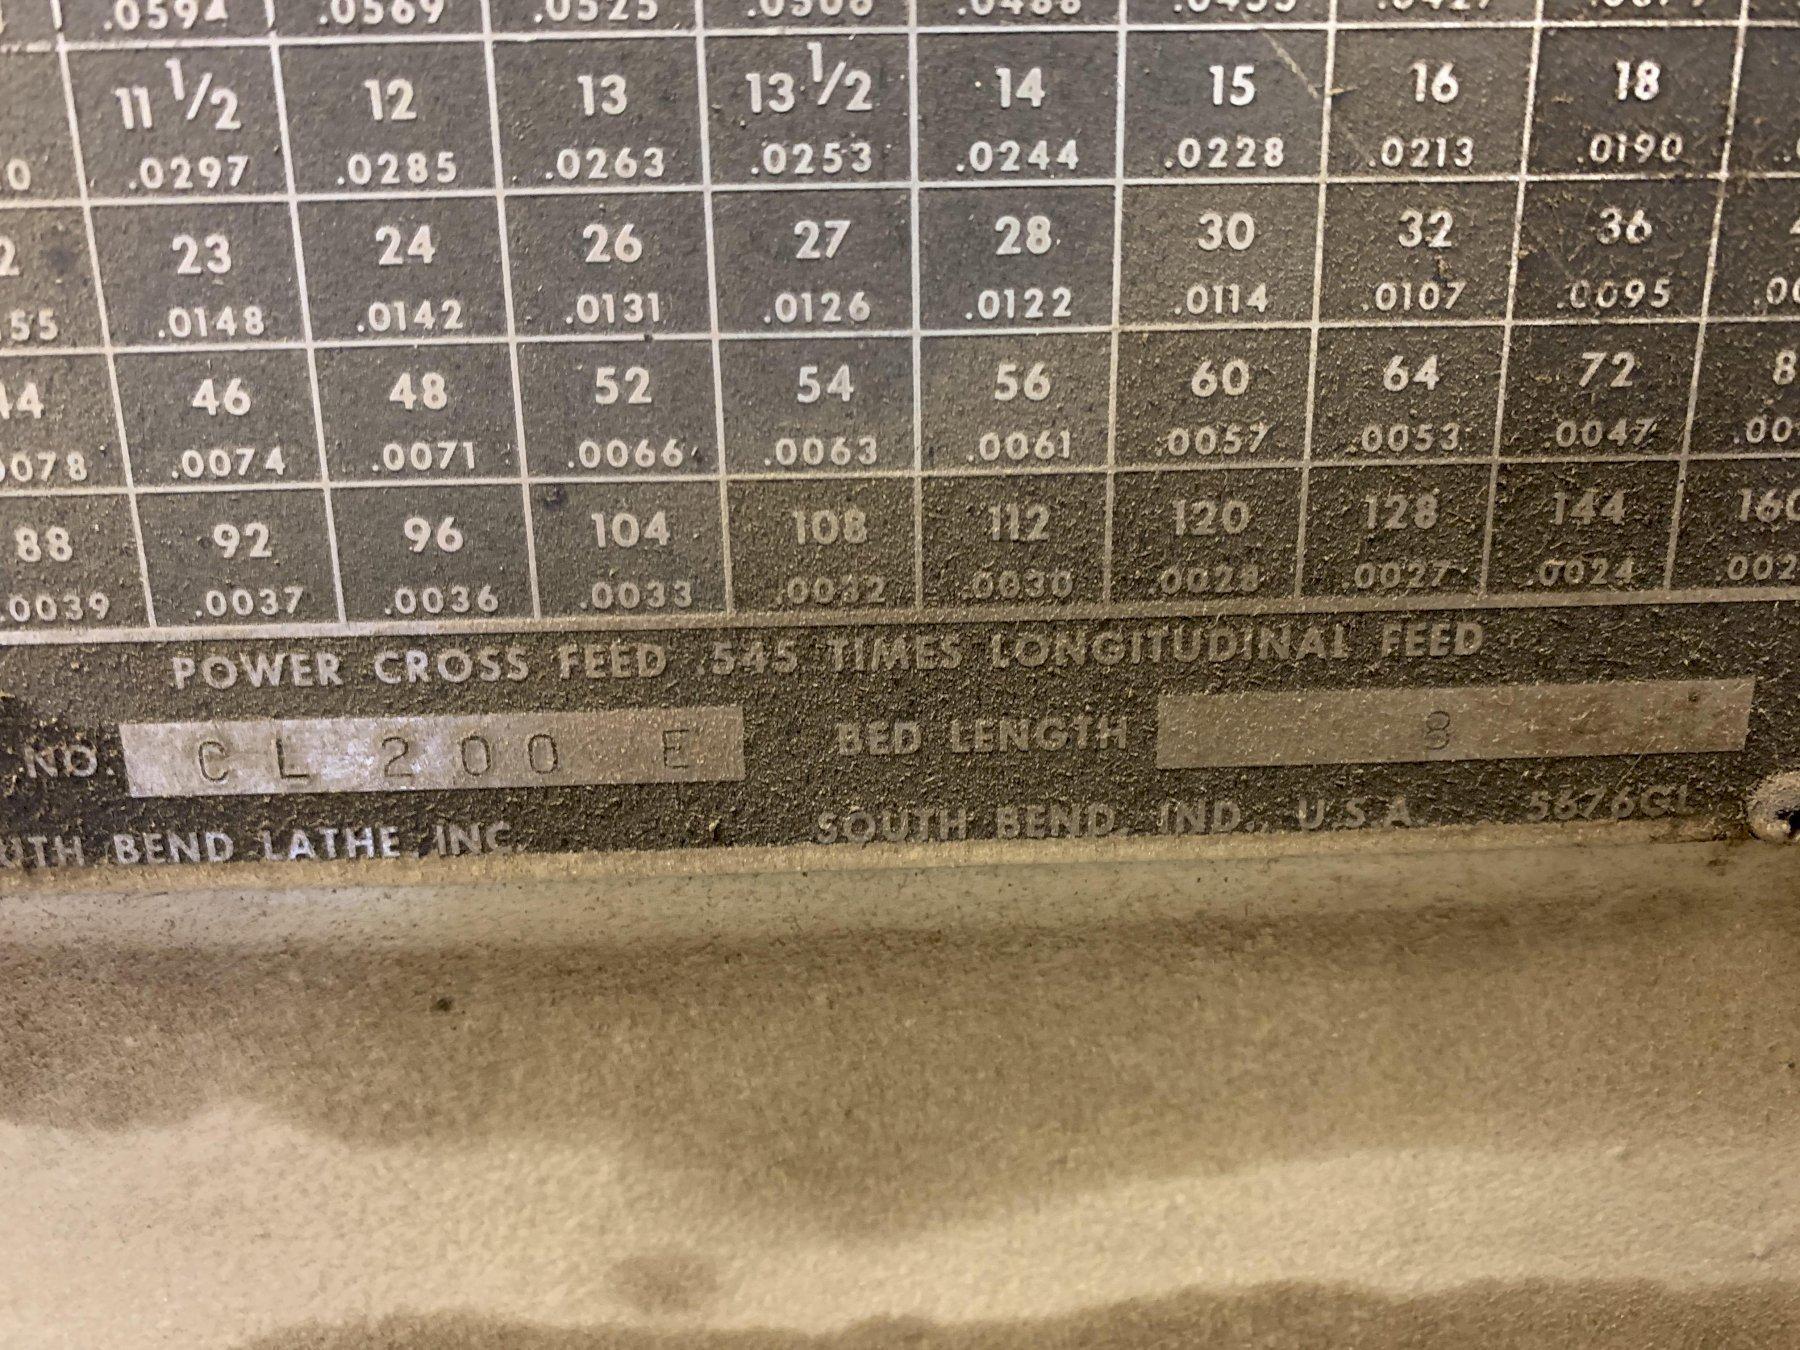 "20"" x 54"" South Bend Turn-Nado Geared Head Engine Lathe, S/N GL2954."